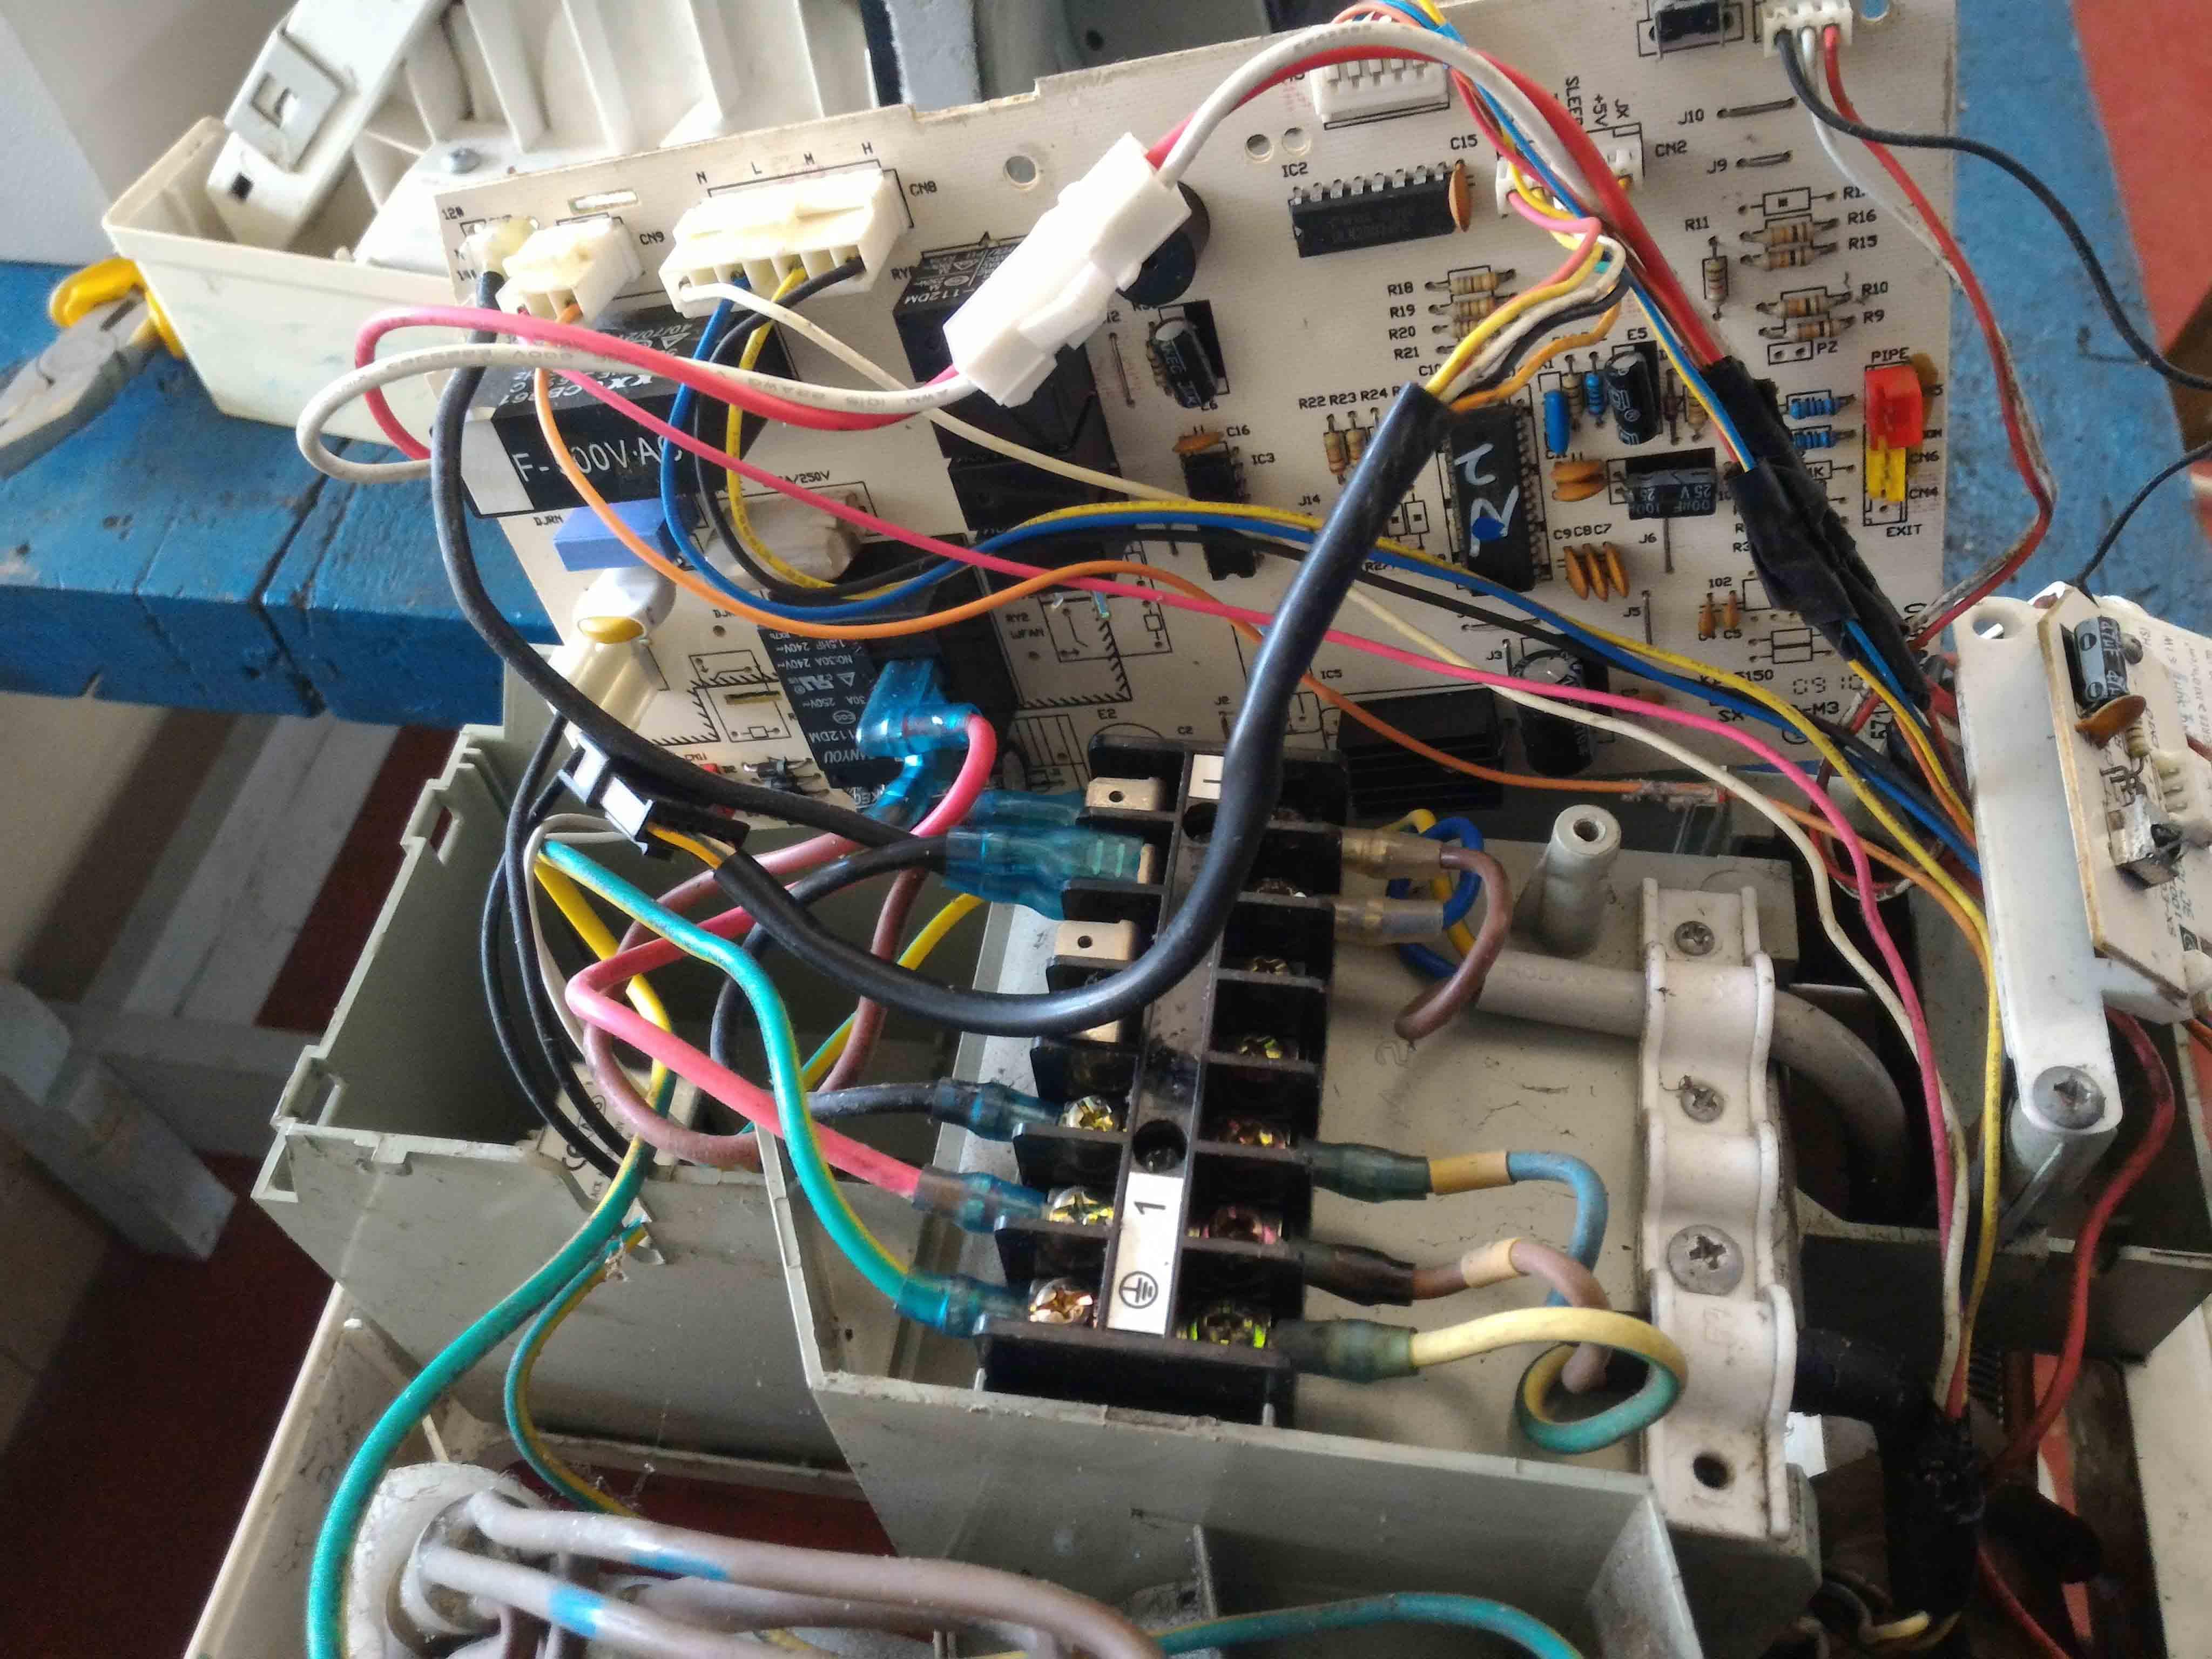 Instalasi Kelistrikan pada Proses Pemasangan AC Split